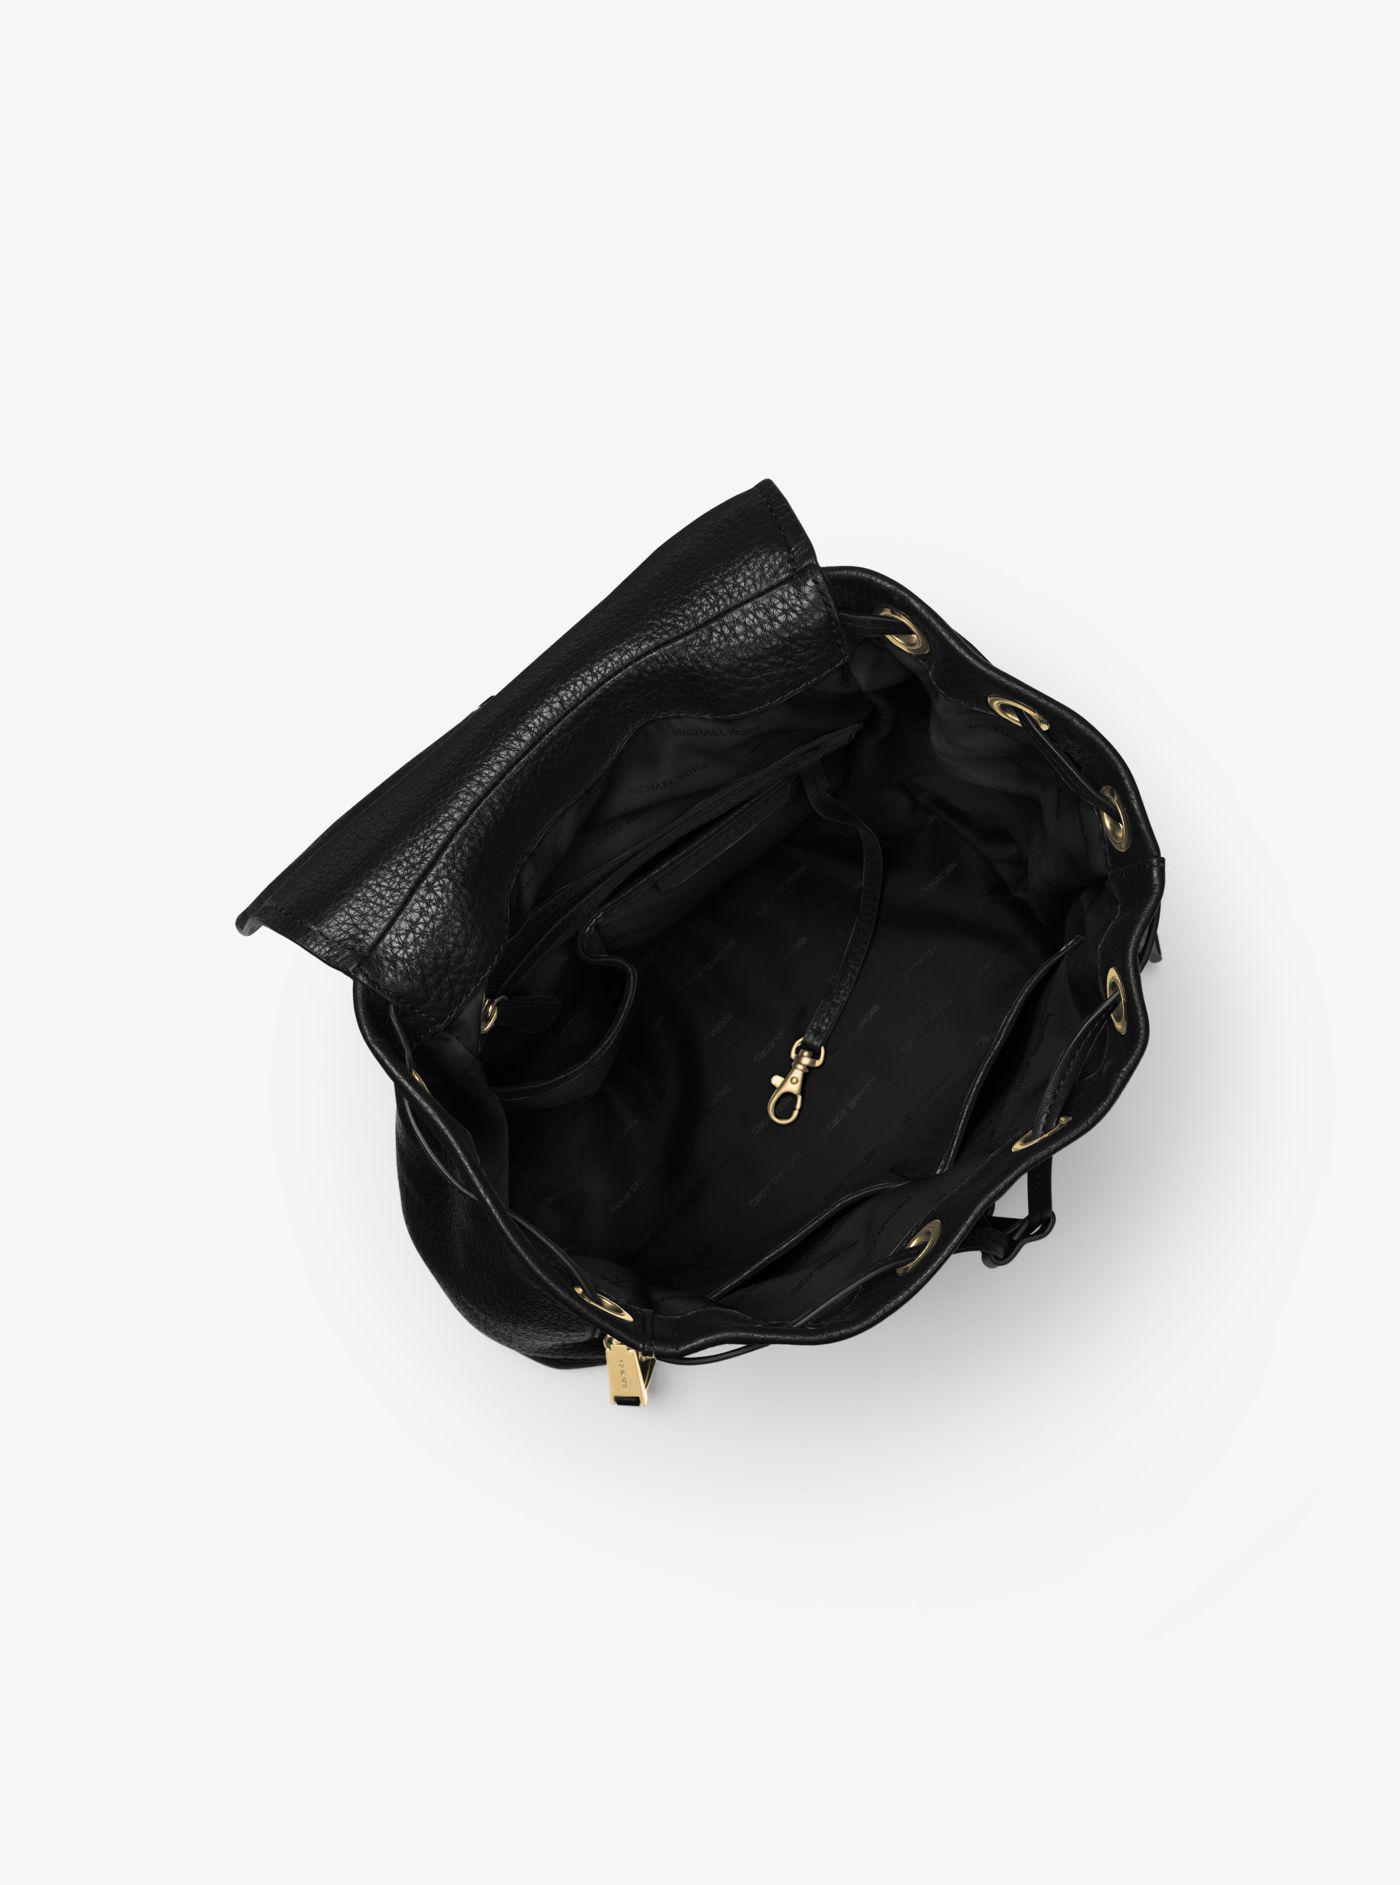 3354baaf6a51 ... discount michael kors black viv large leather backpack lyst. view  fullscreen e33ff 8ee6b